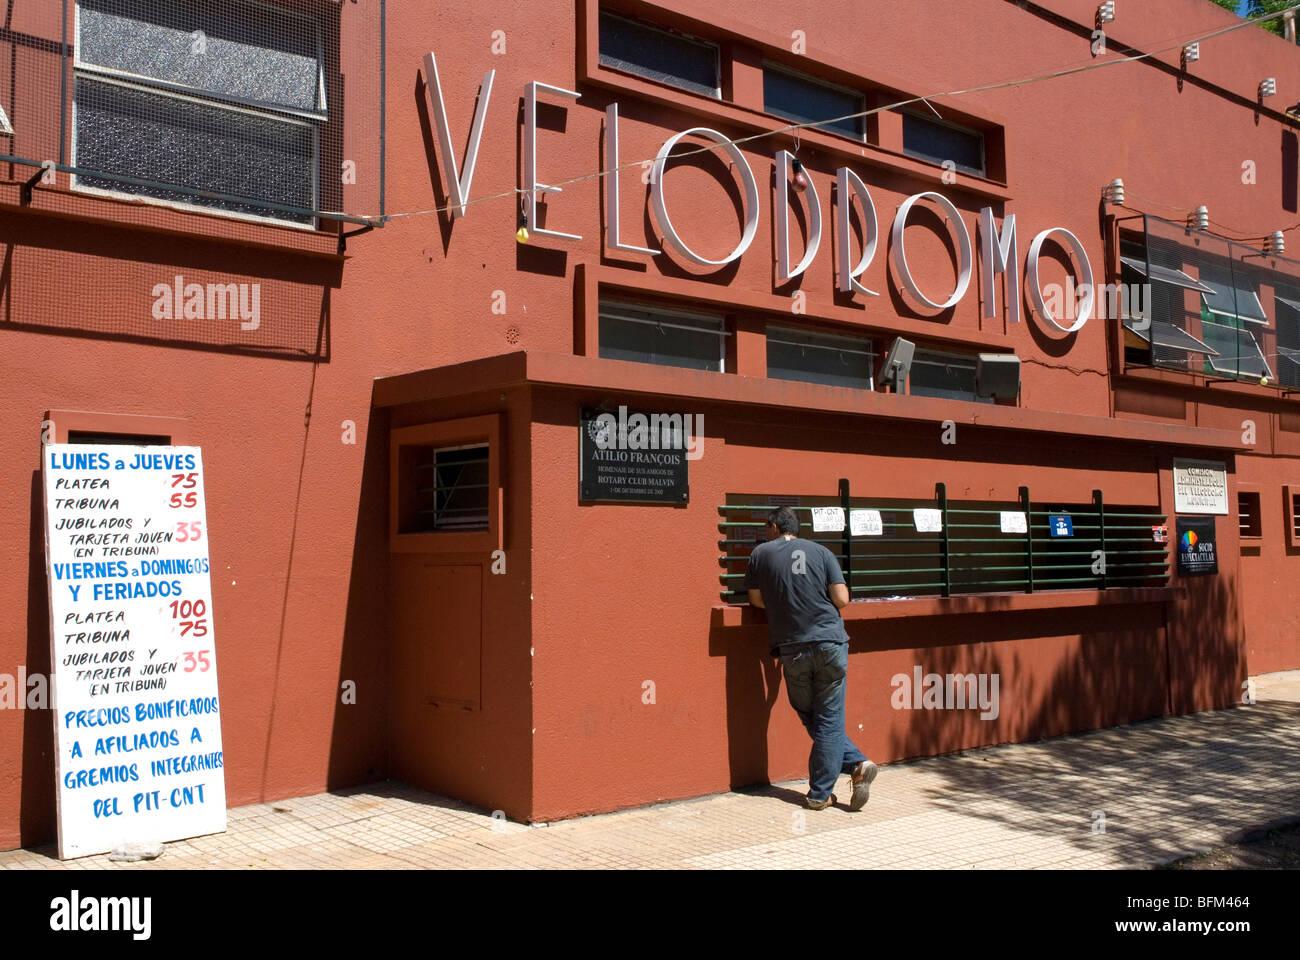 art deco velodromo box office in montevideo uruguay art deco office